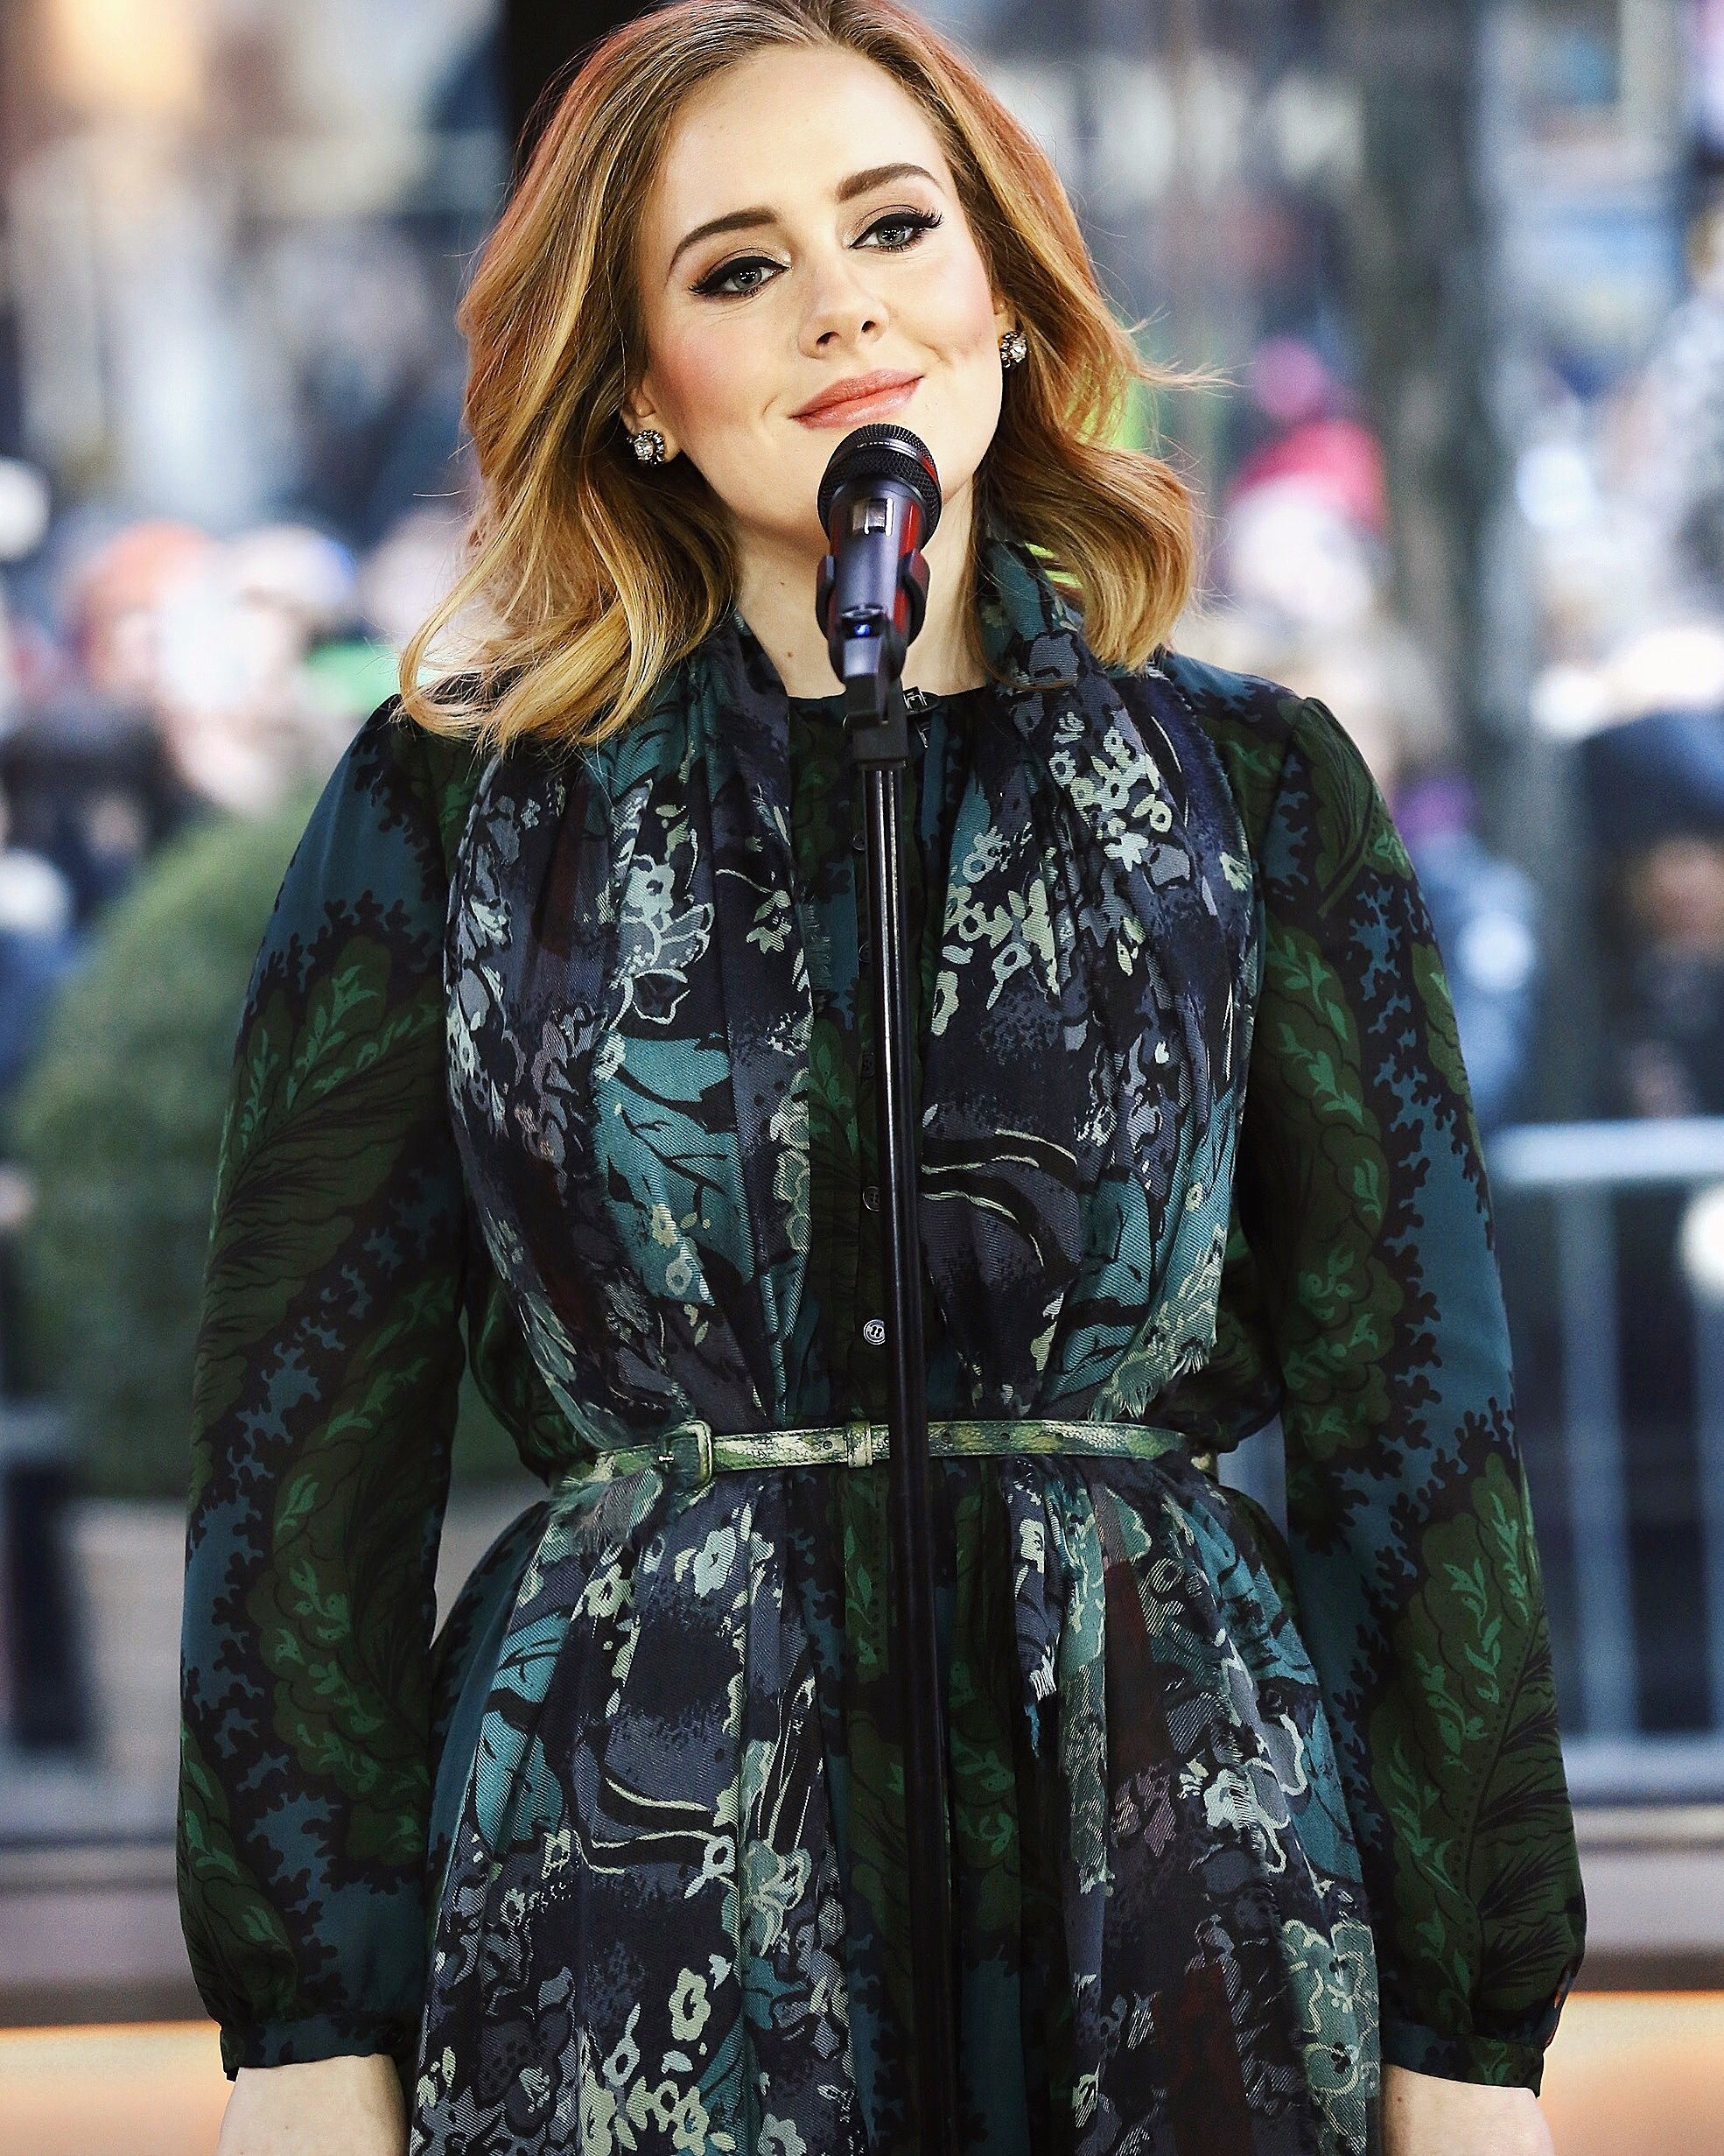 Watch Adele Silva See Through pics. 2018-2019 celebrityes photos leaks! video